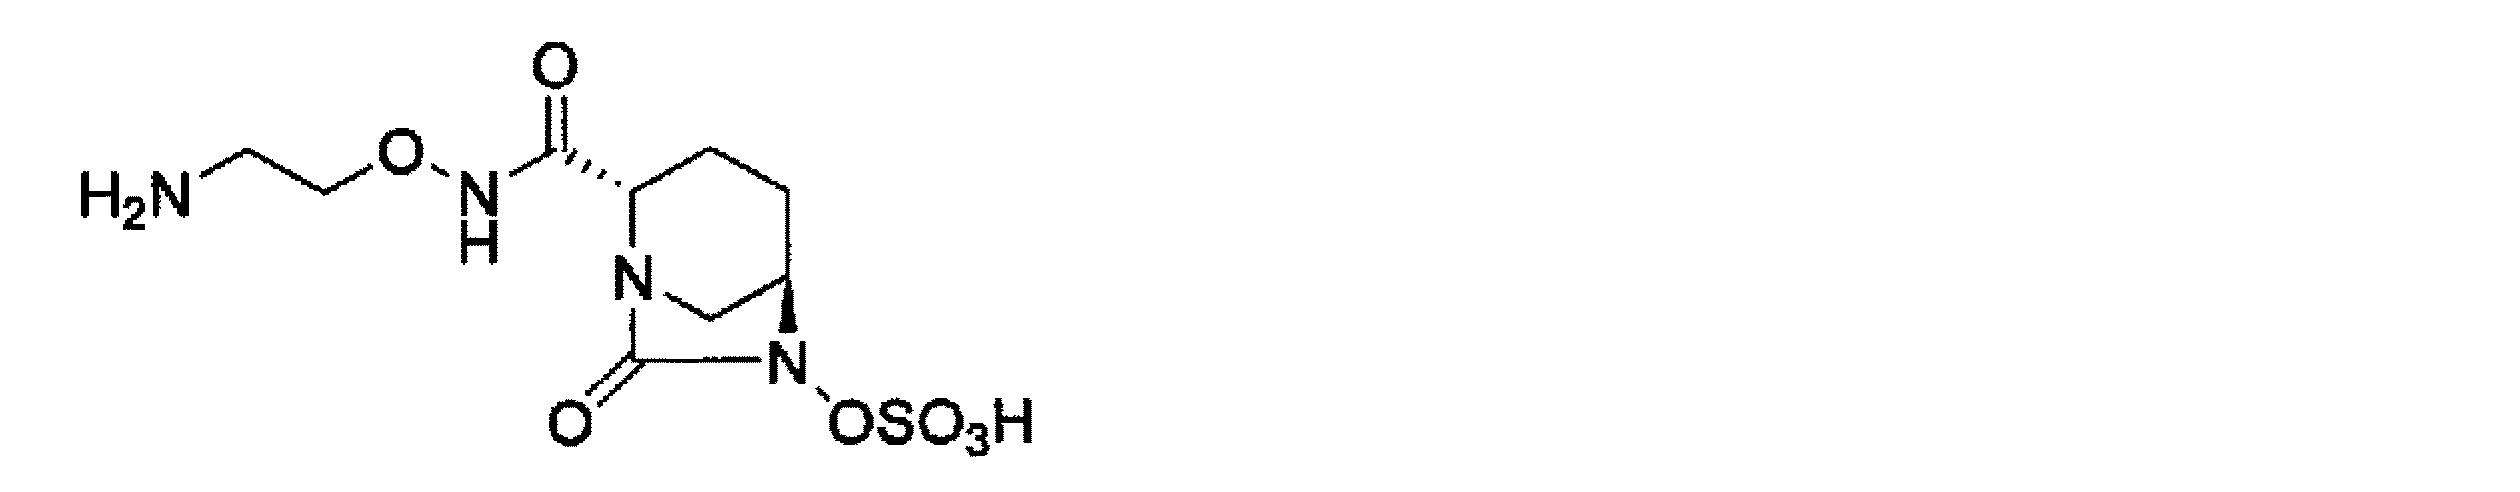 Figure JPOXMLDOC01-appb-C000130